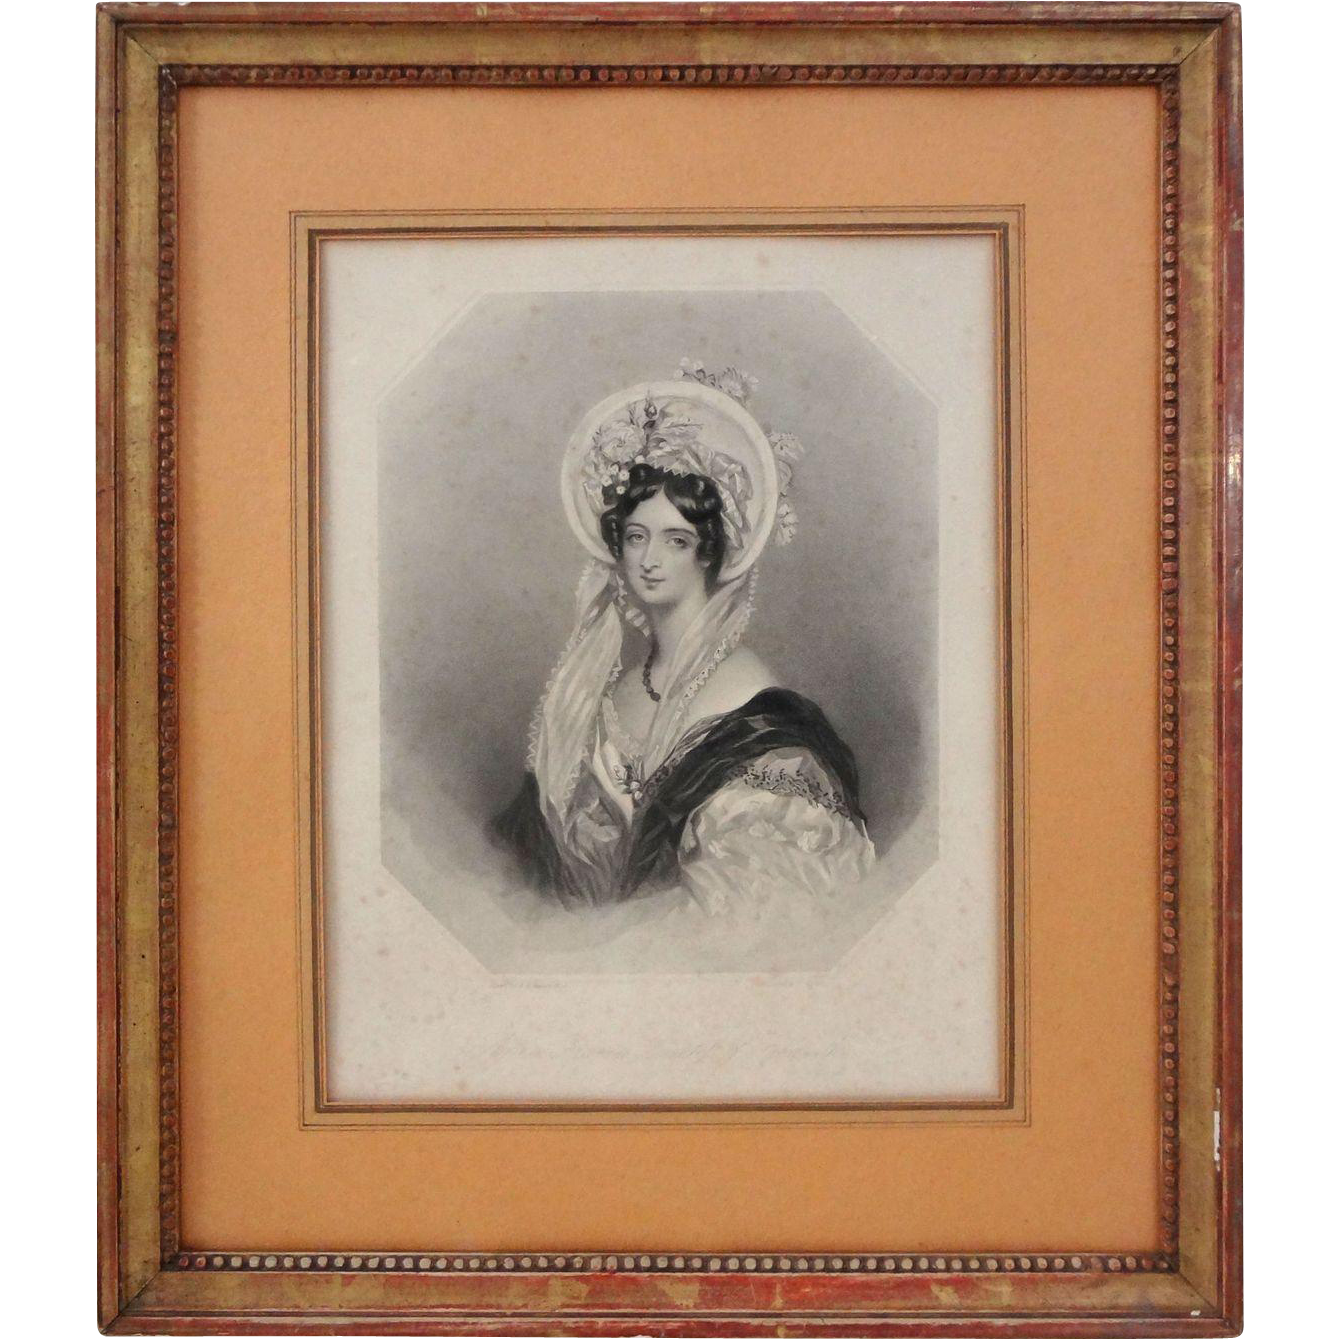 English Peerage Lady Female Nobility Aristocratic Portrait Engraving Portrait Gilt Wood Frame - 1838, England